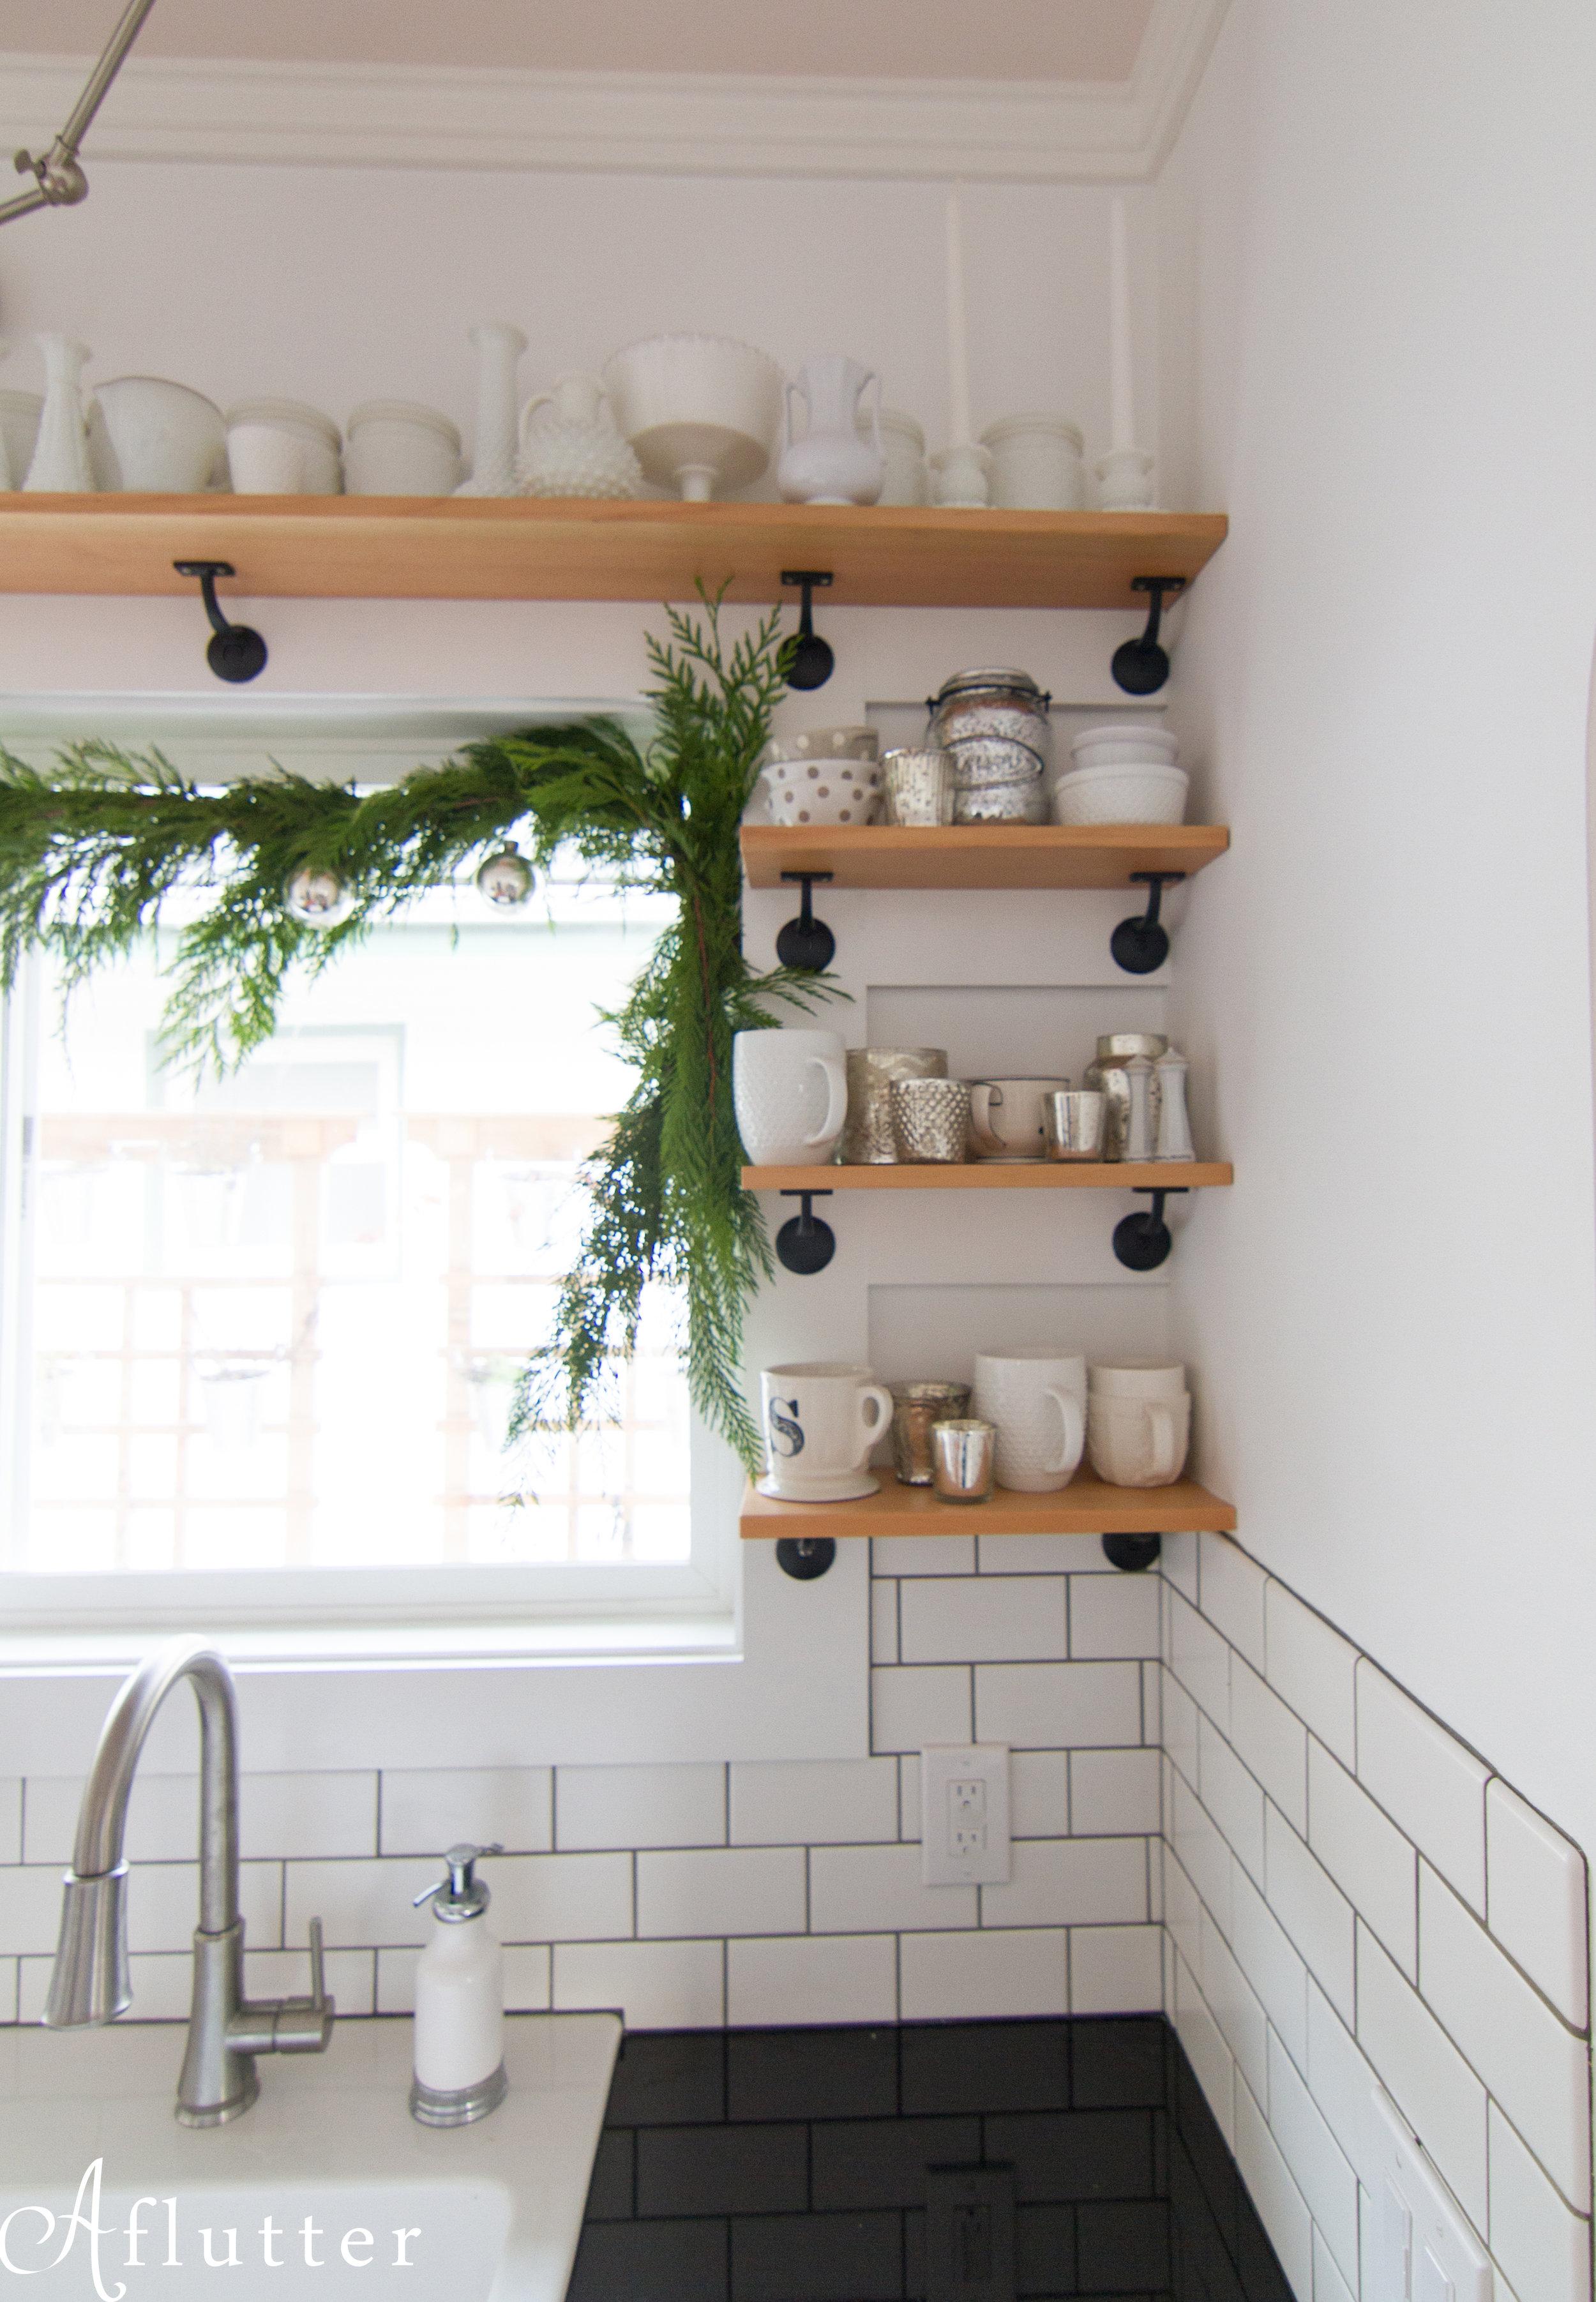 Christmas-Kitchen-Reveal-14-of-20.jpg